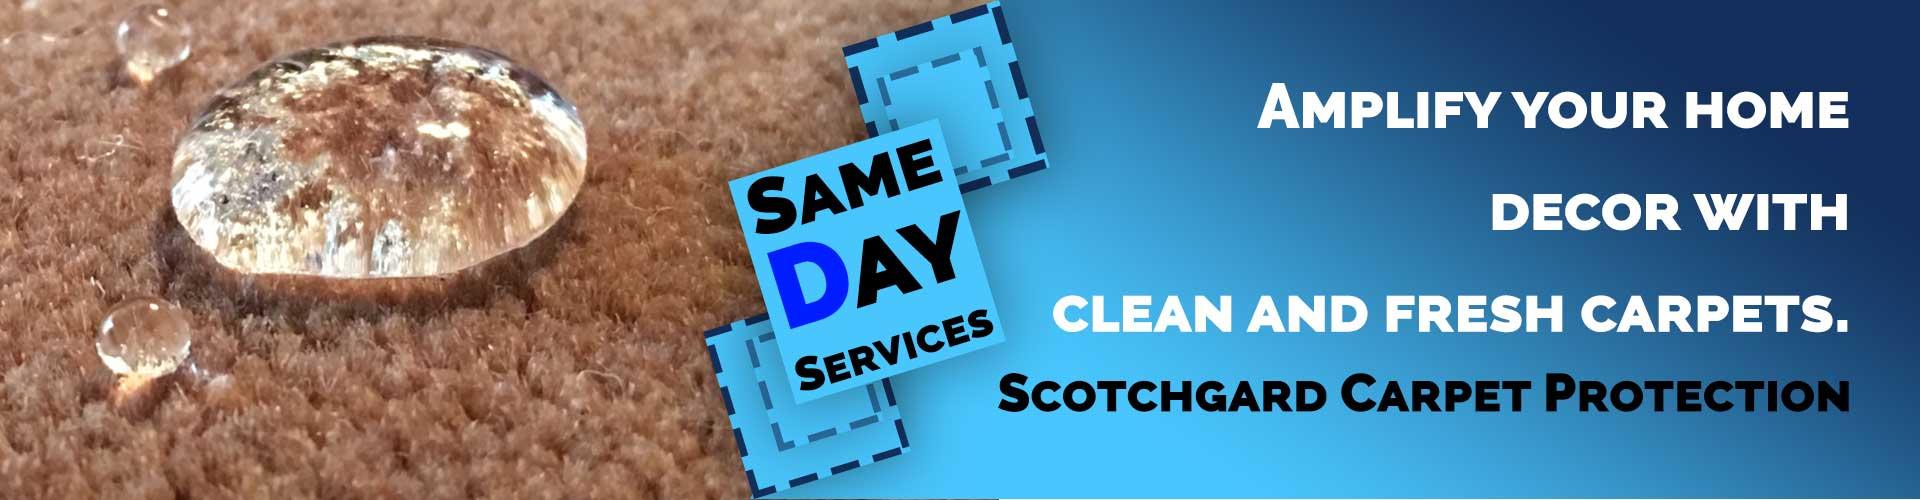 Sctchgard carpet protection